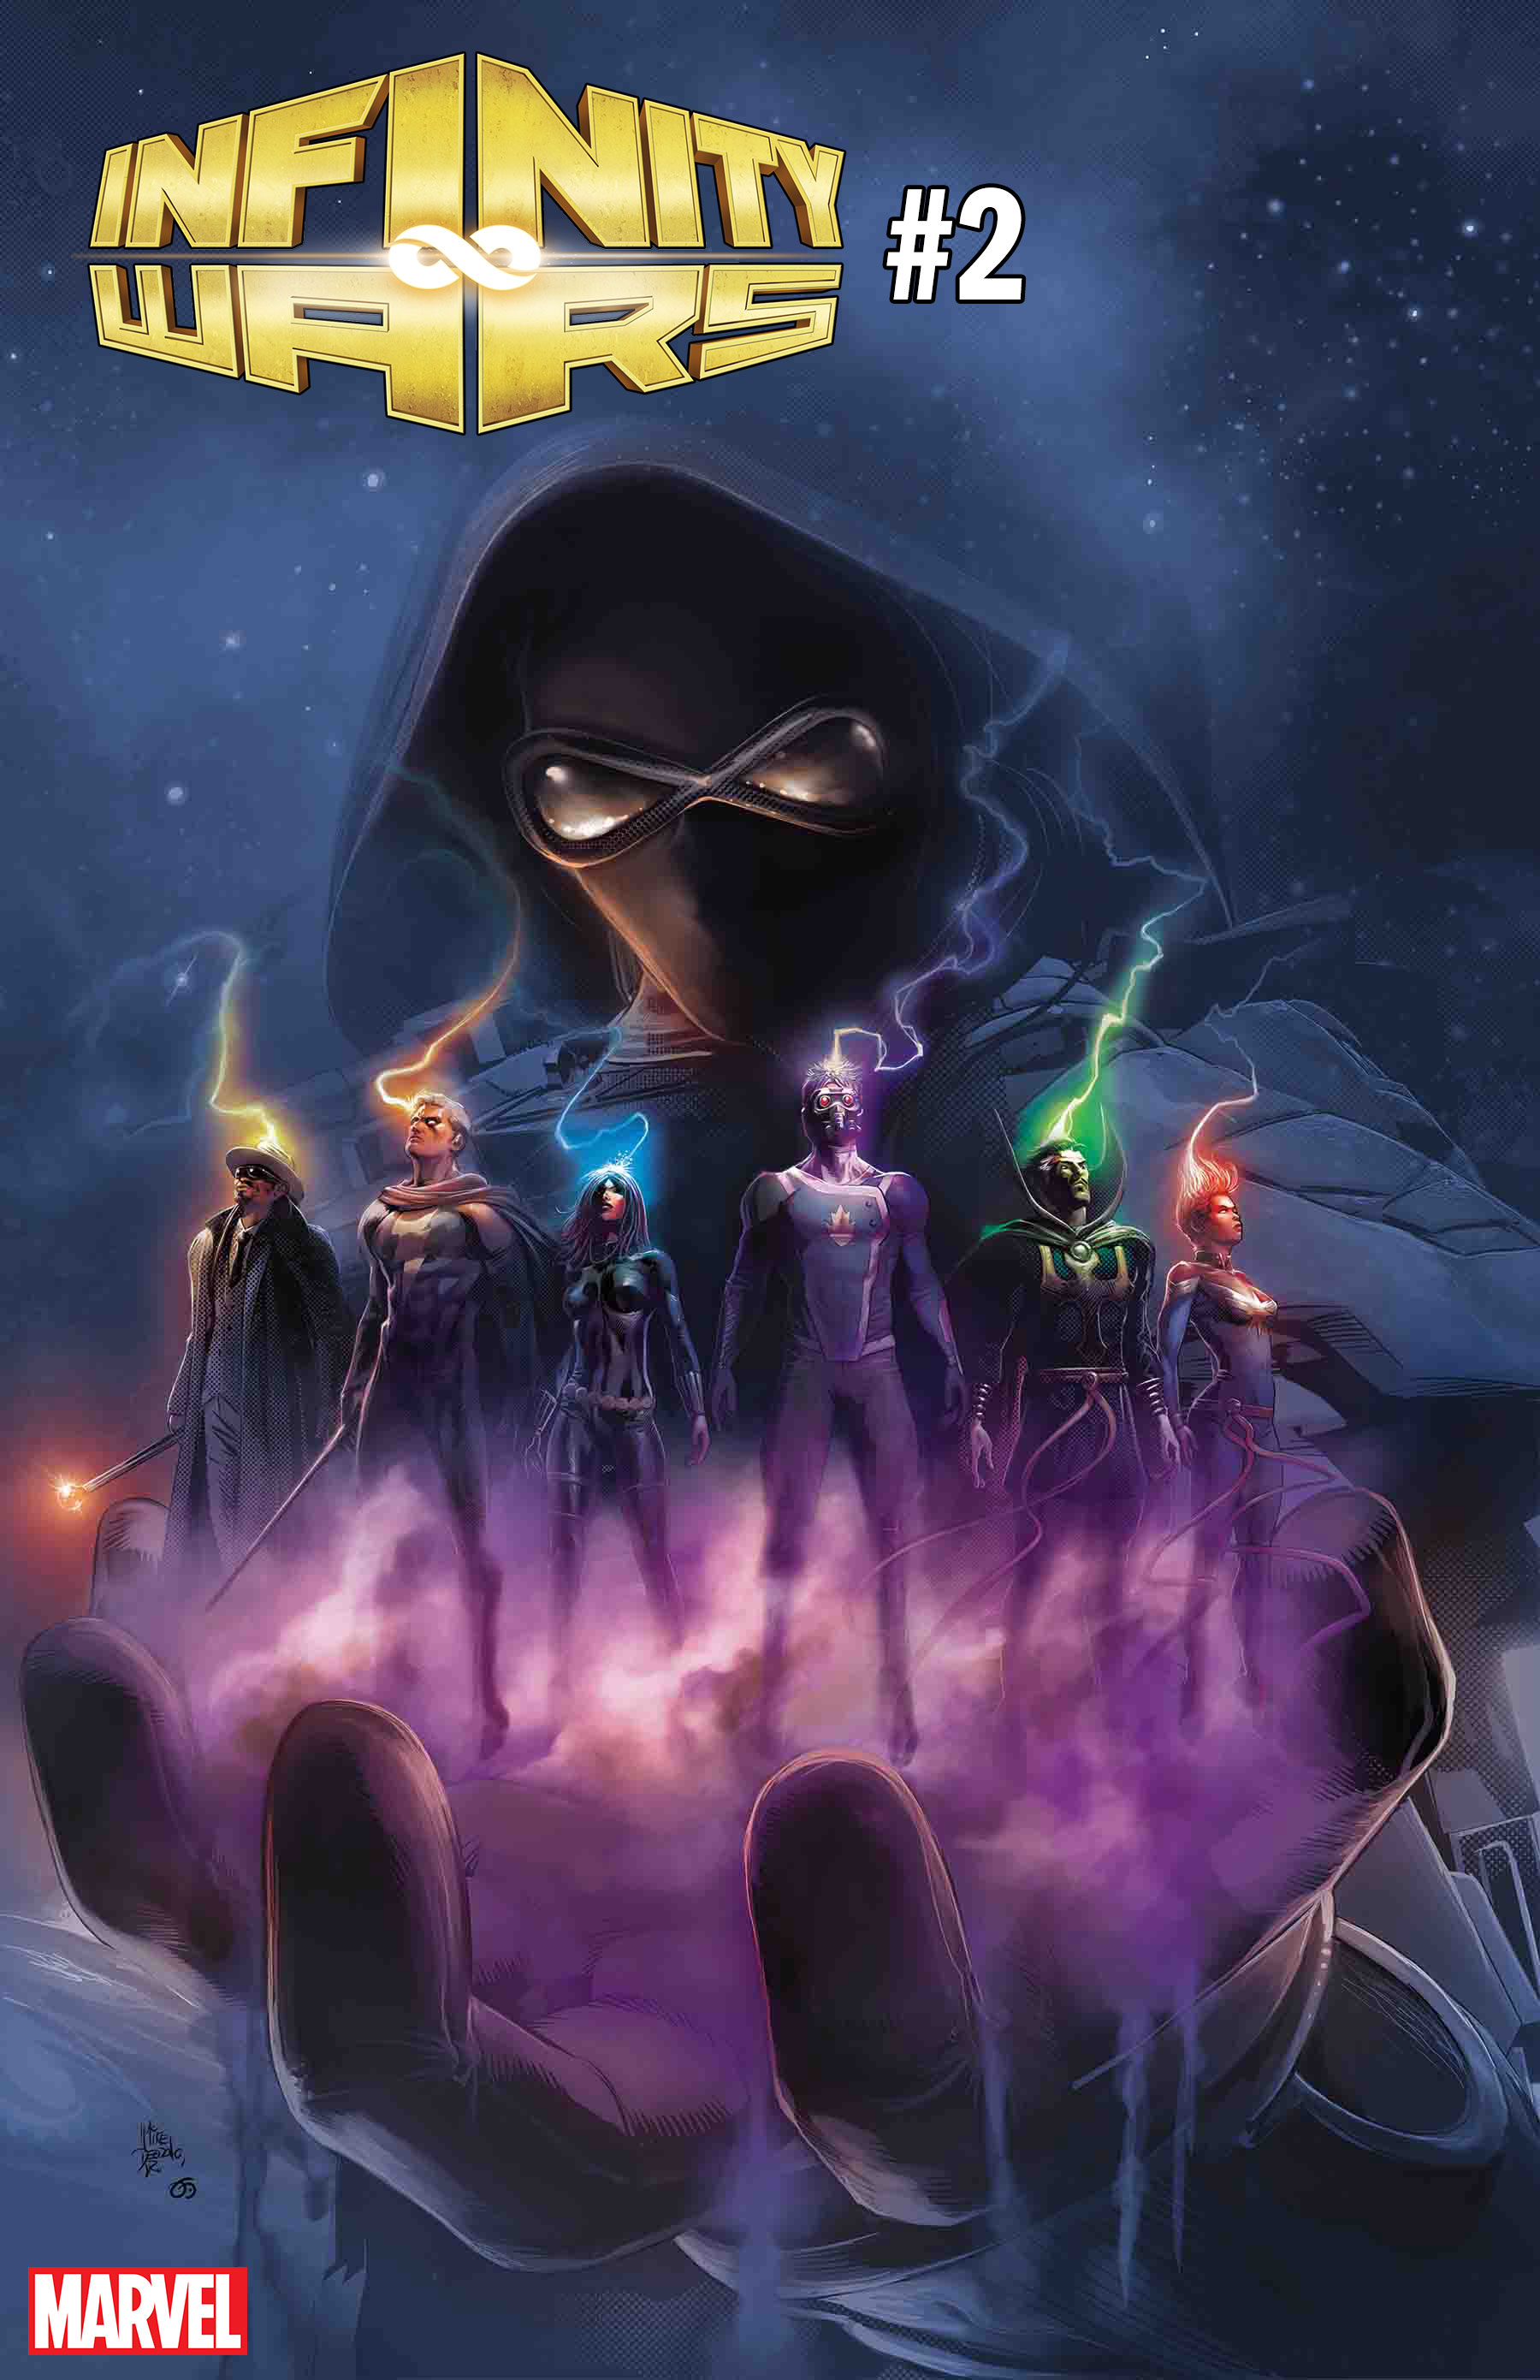 Infinity Wars #2